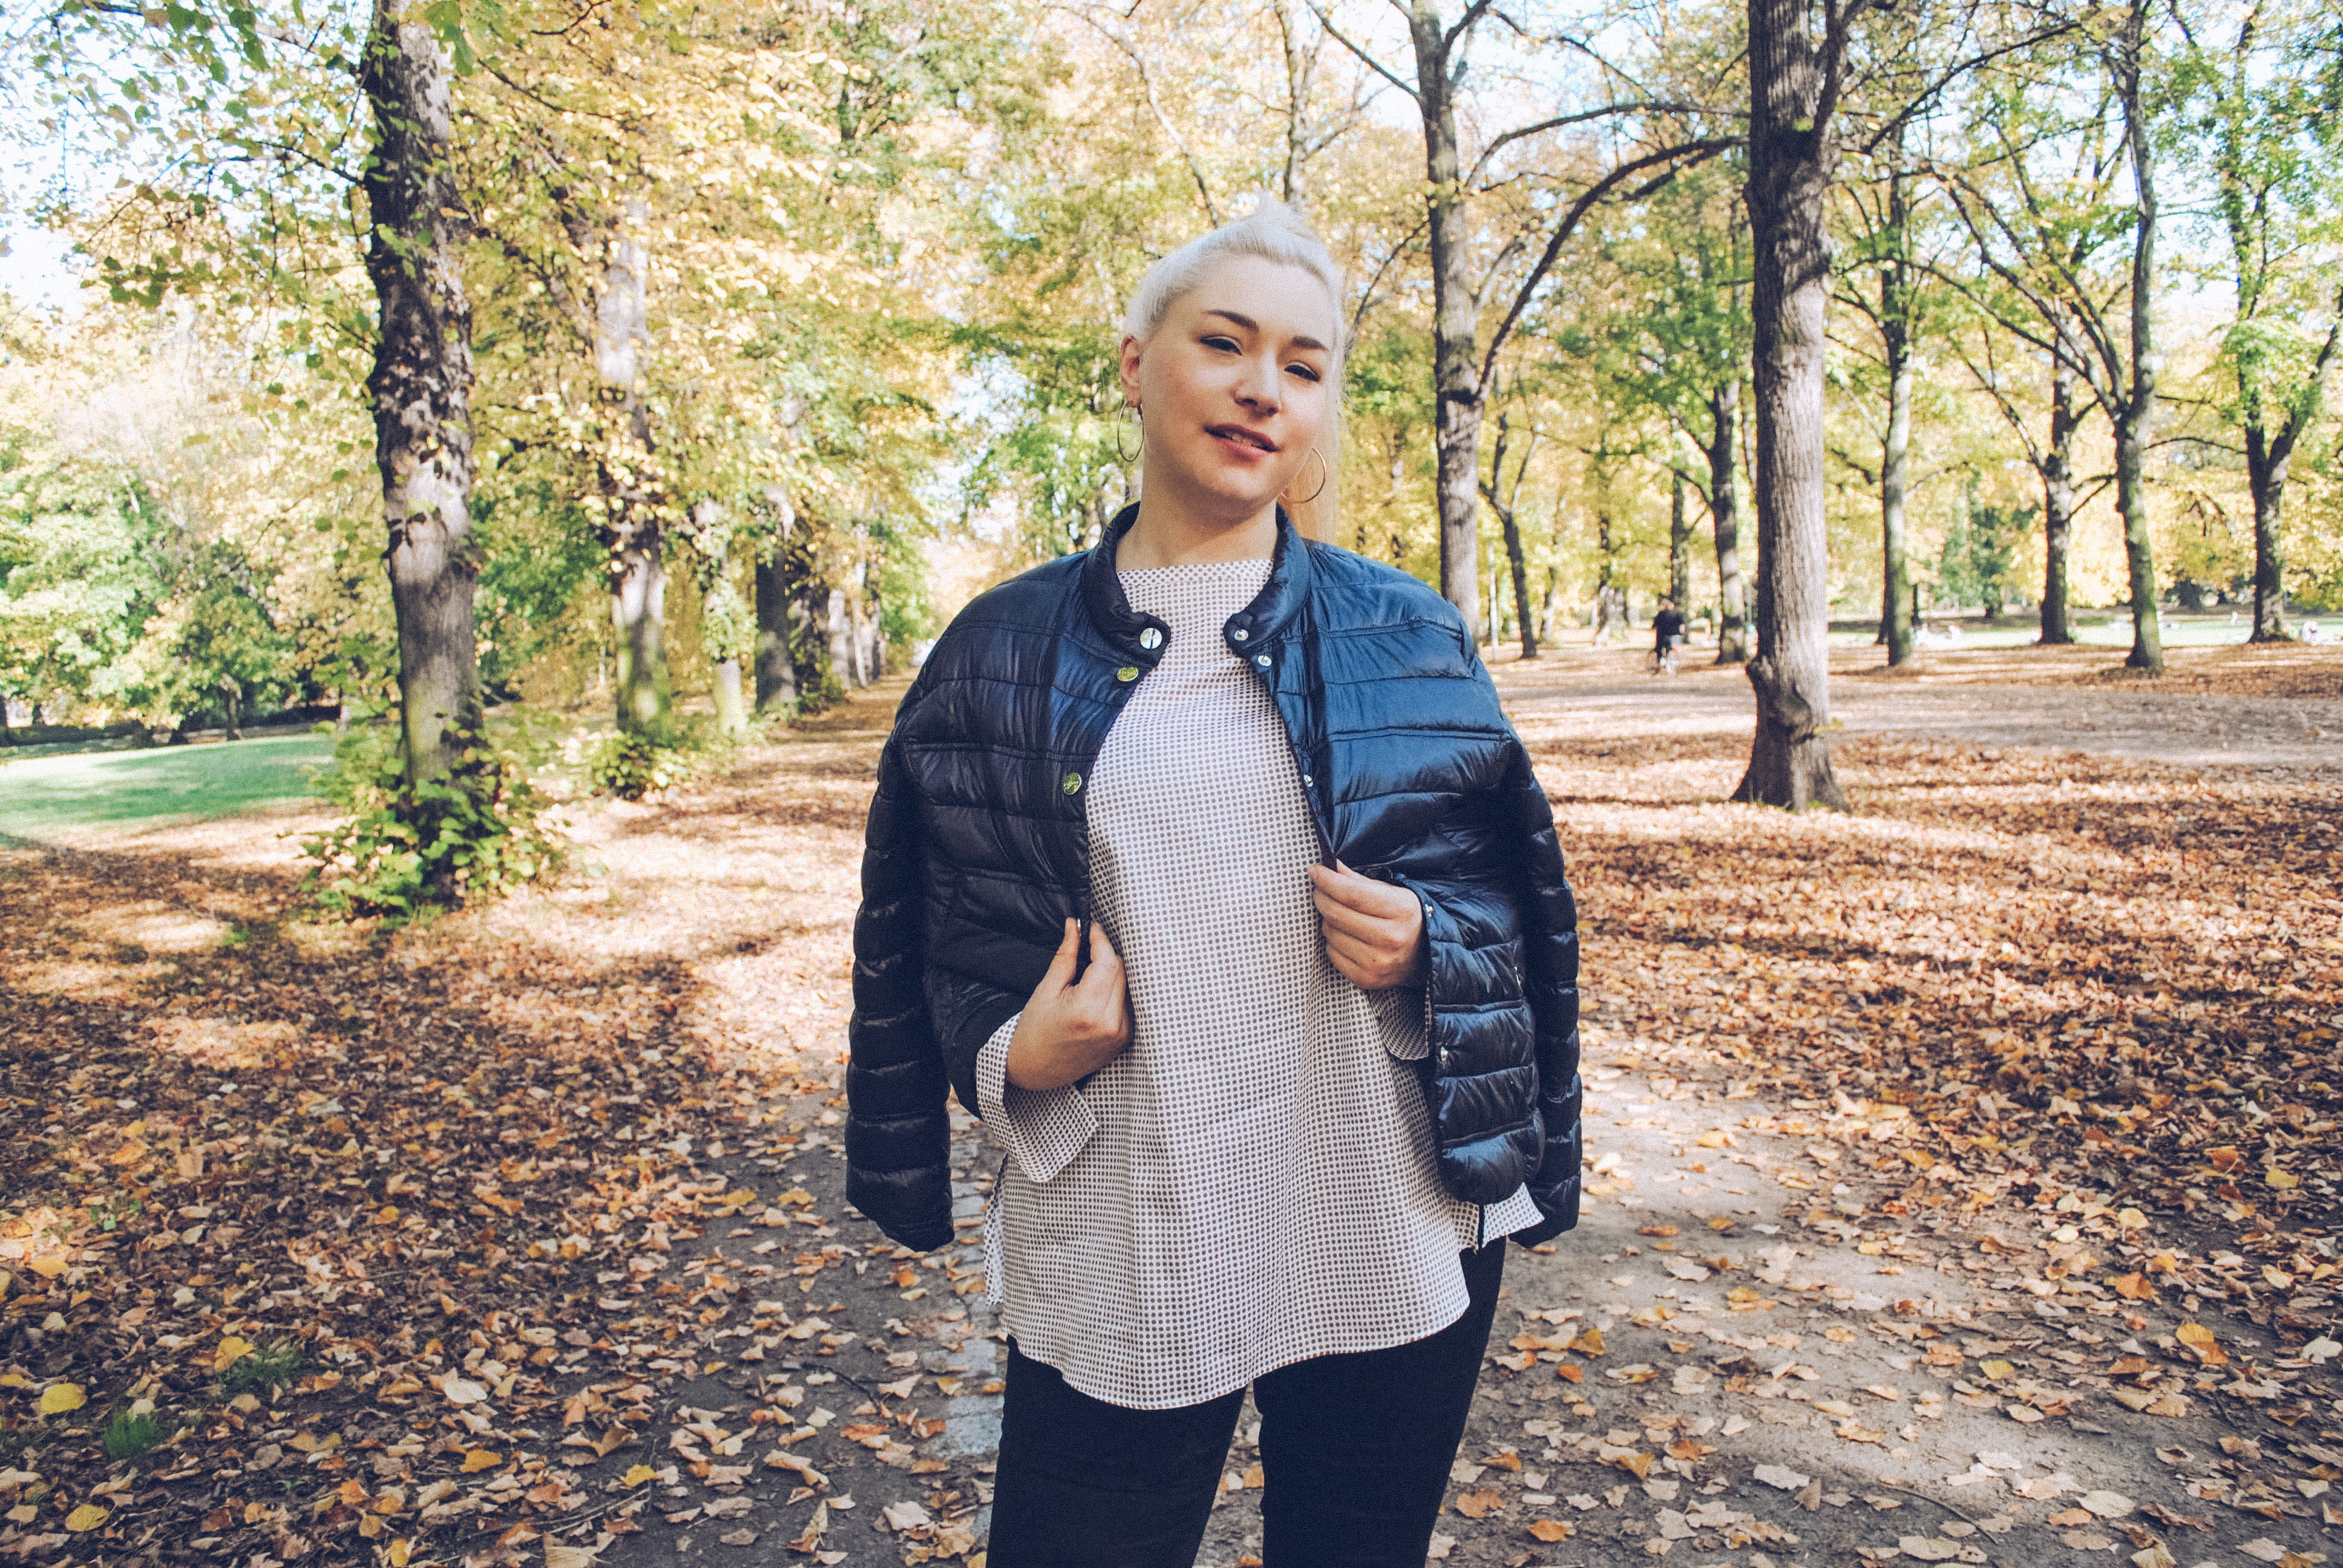 Blonde Frau in kurzer schwarzer Steppjacke